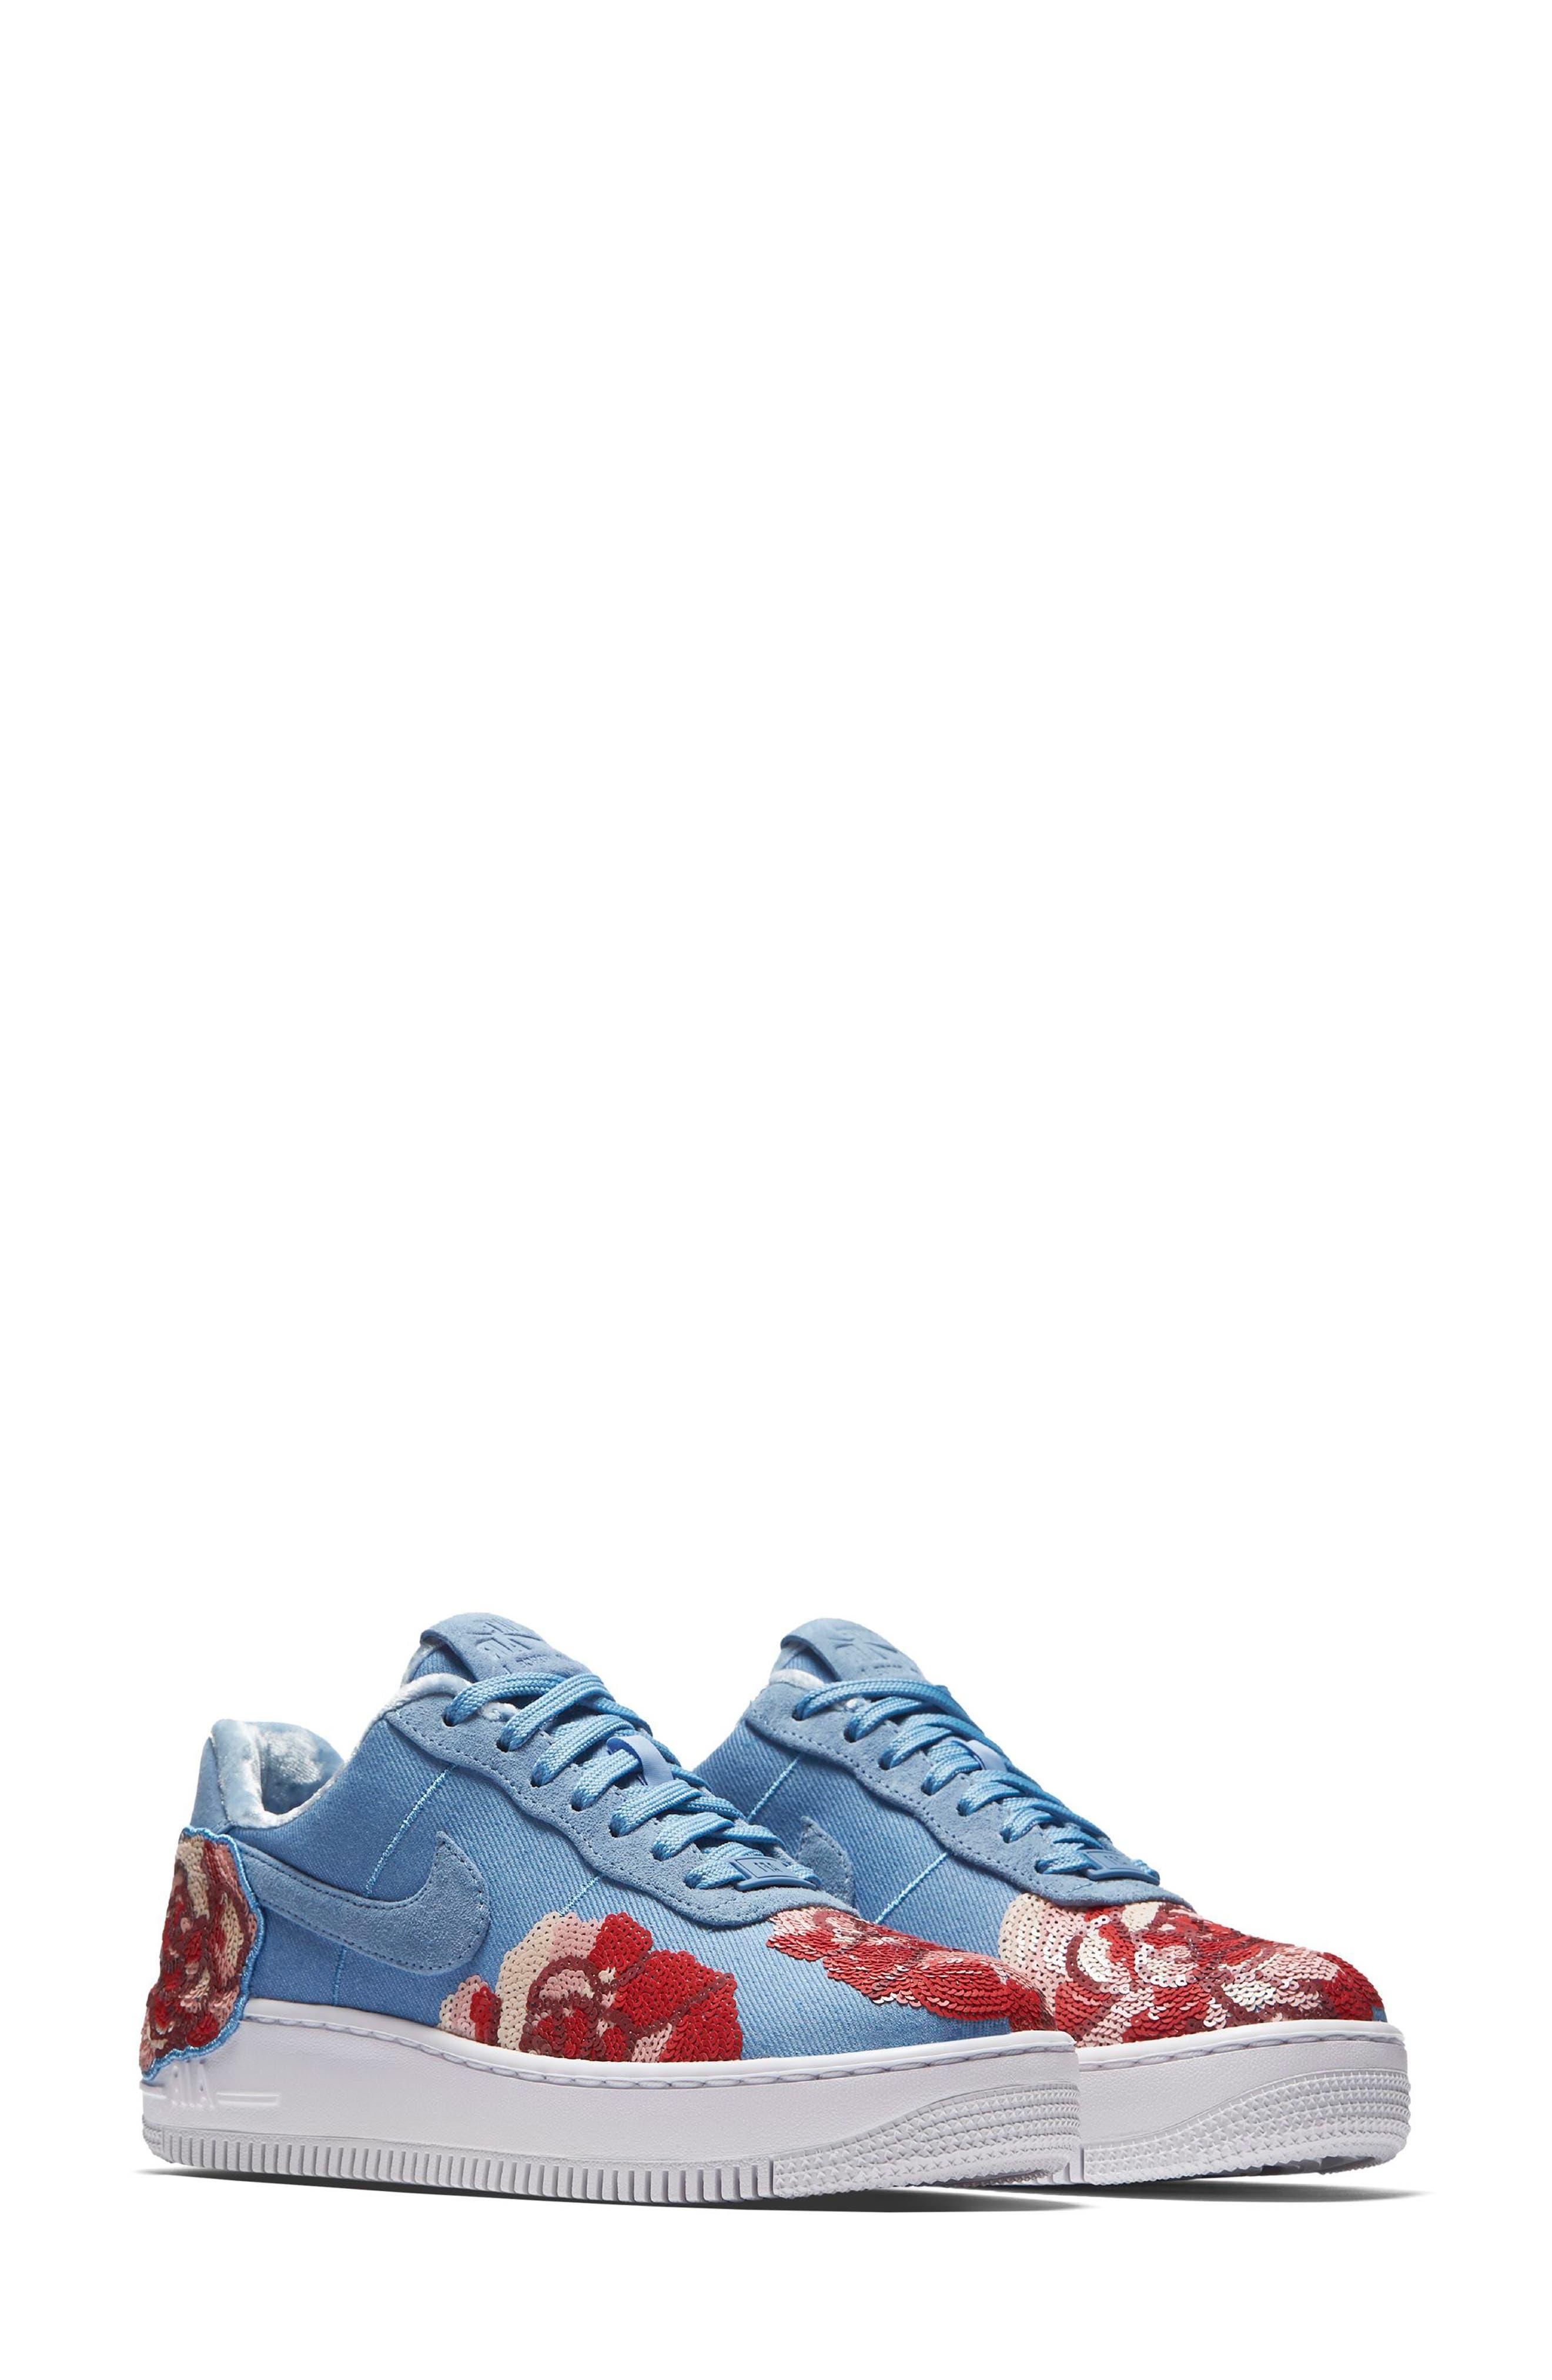 Nike Women's Air Force 1 Upstep LX Shoe (Women)